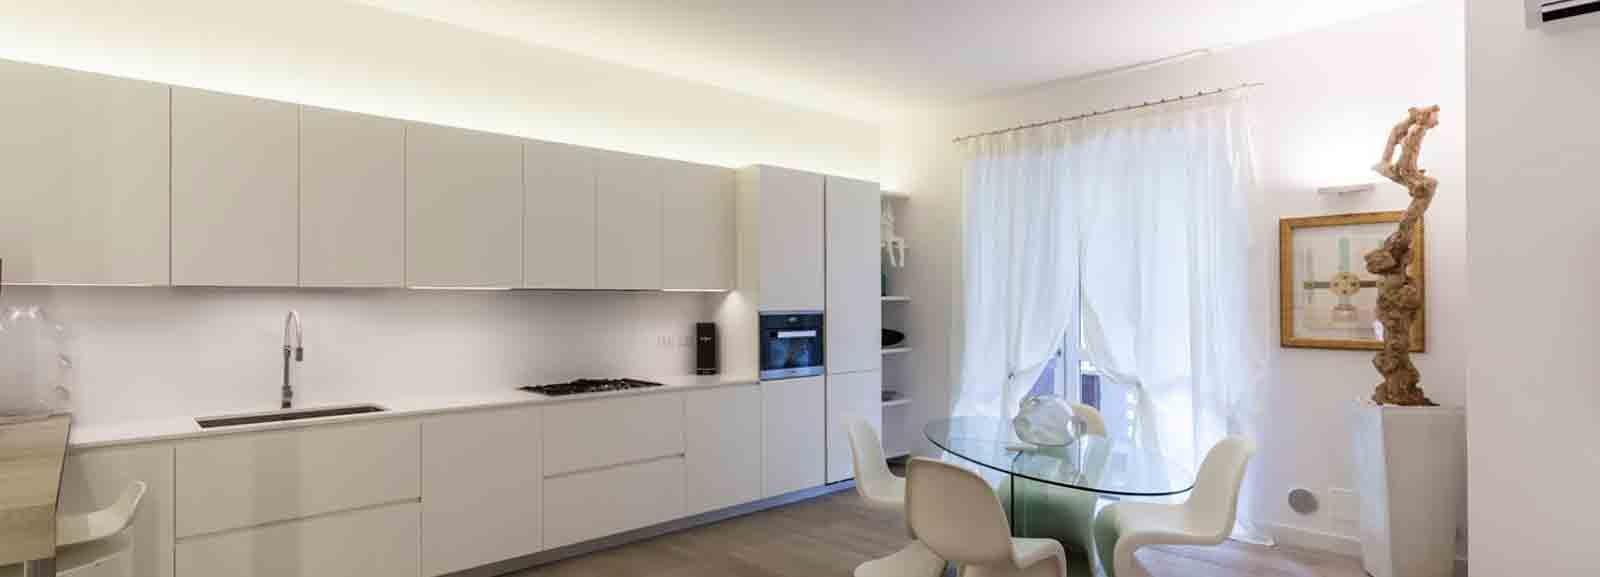 soggiorno living con cucina a vista ~ dragtime for . - Soggiorno Living Con Cucina A Vista 2